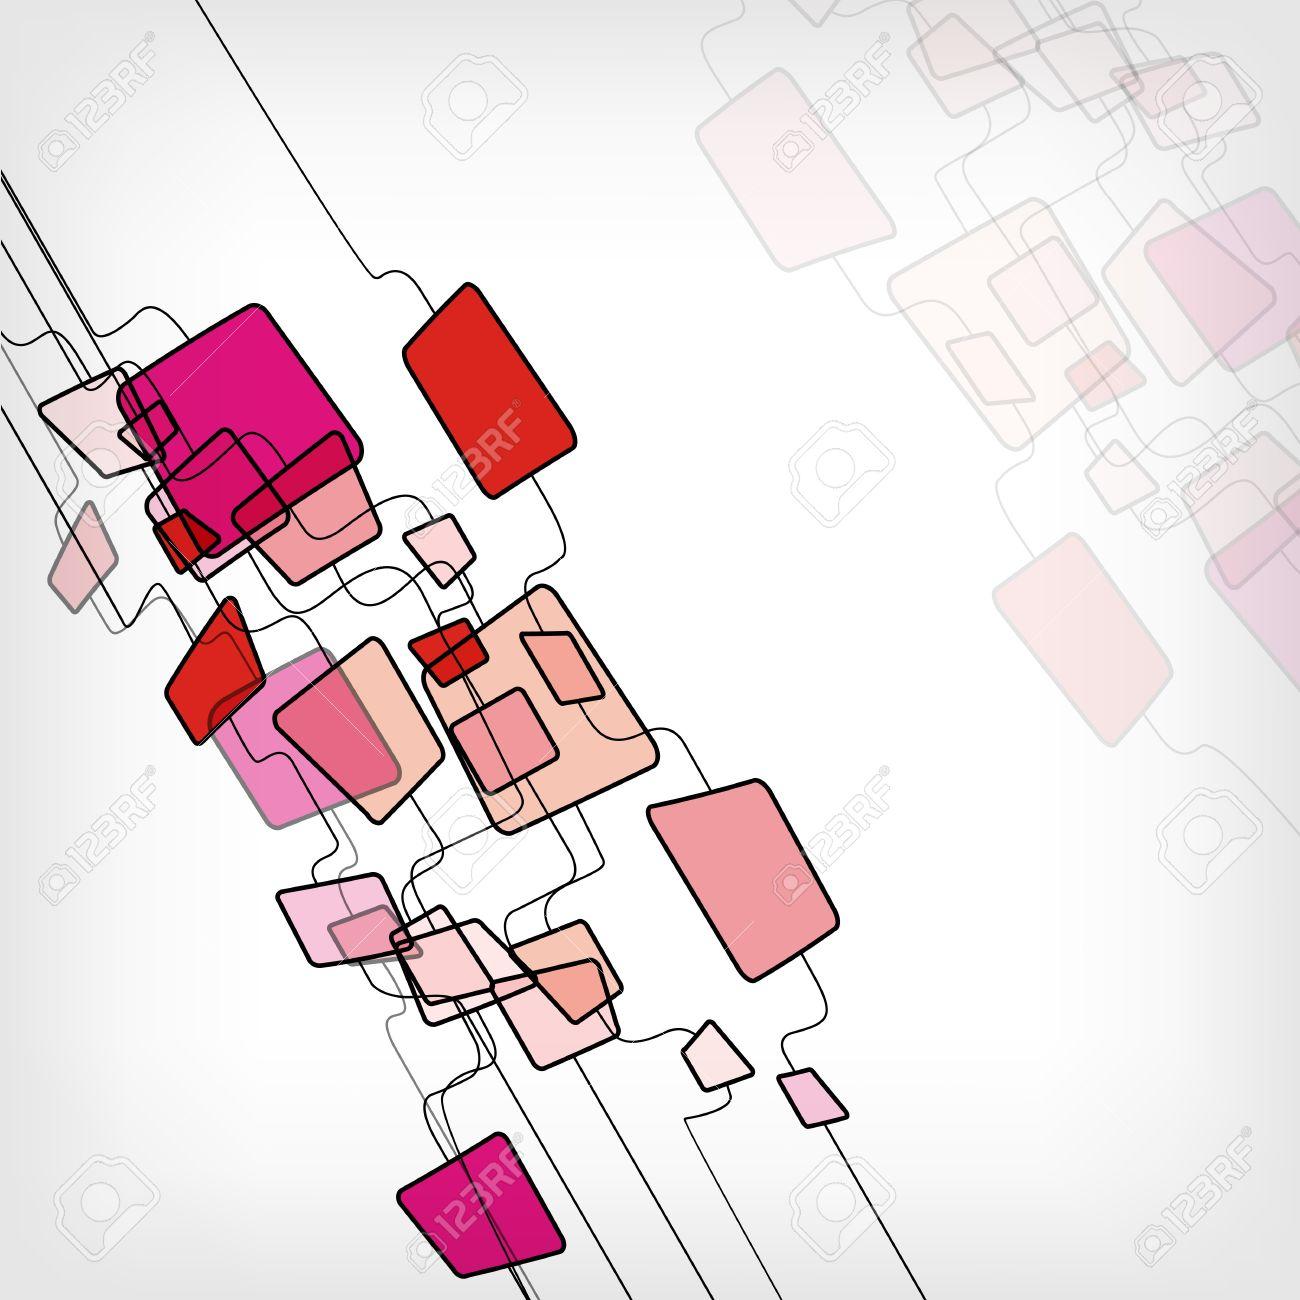 Retro Abstract Design Colorful Square Template - vector illustration Stock Vector - 12902605